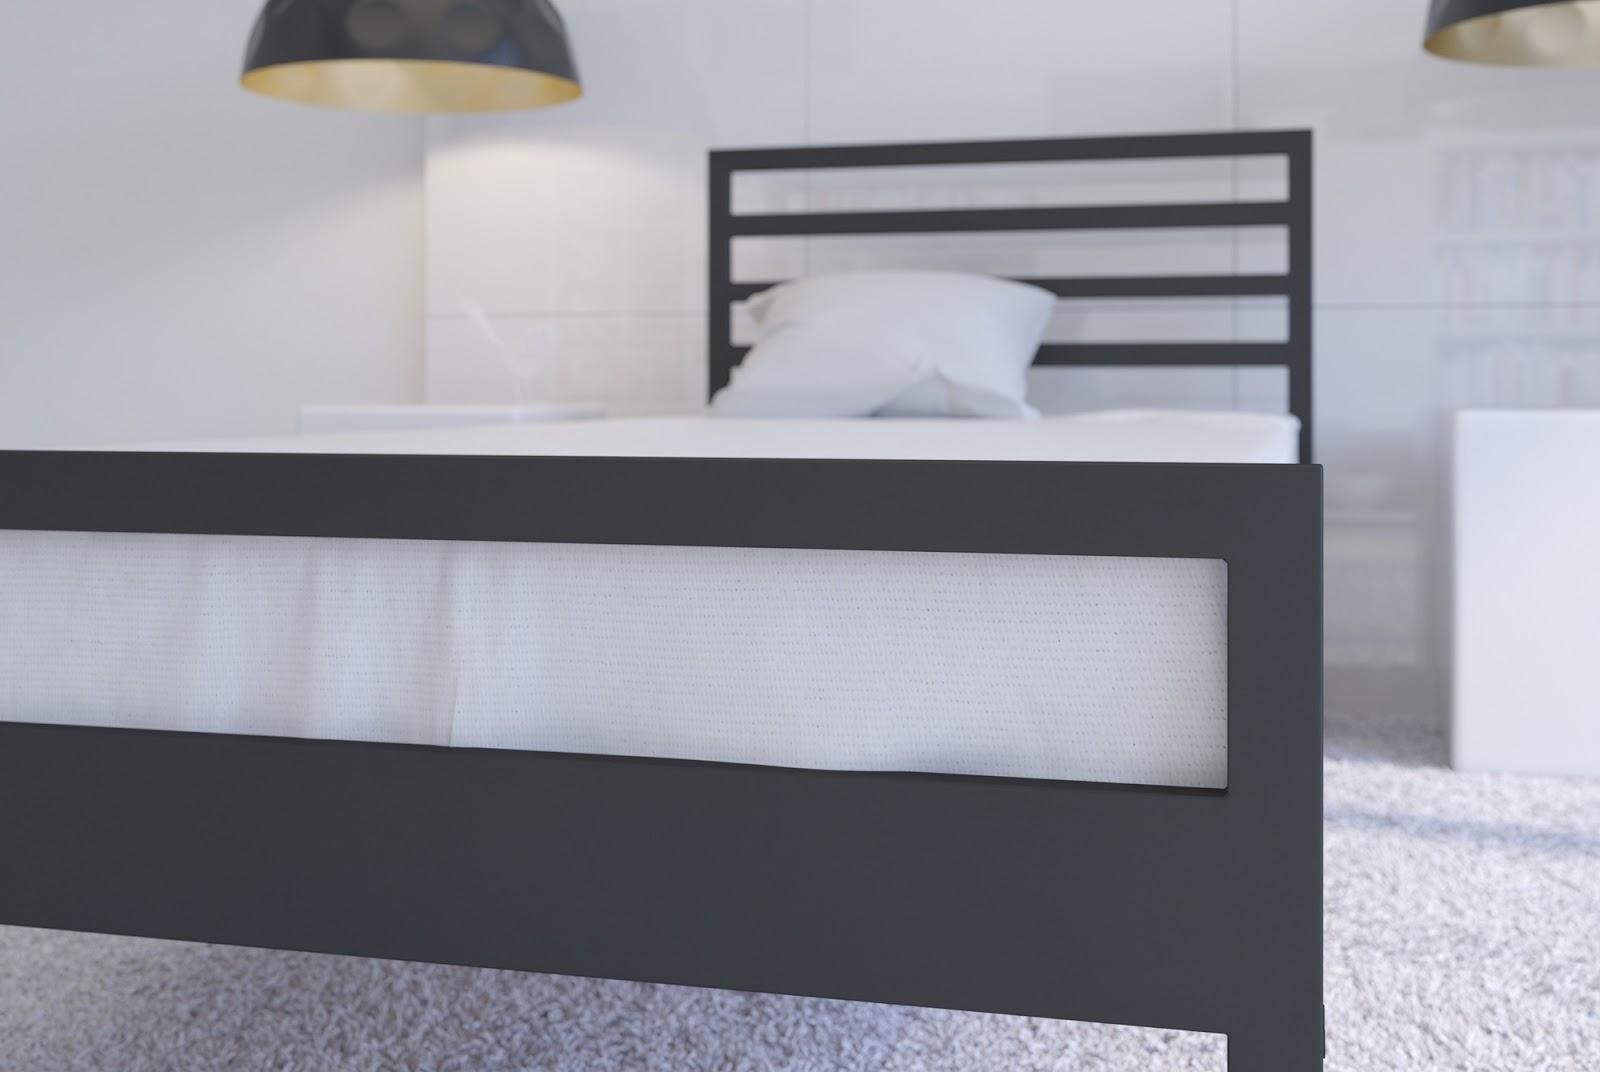 Łóżko metalowe wzór 33 (80-100 cm)